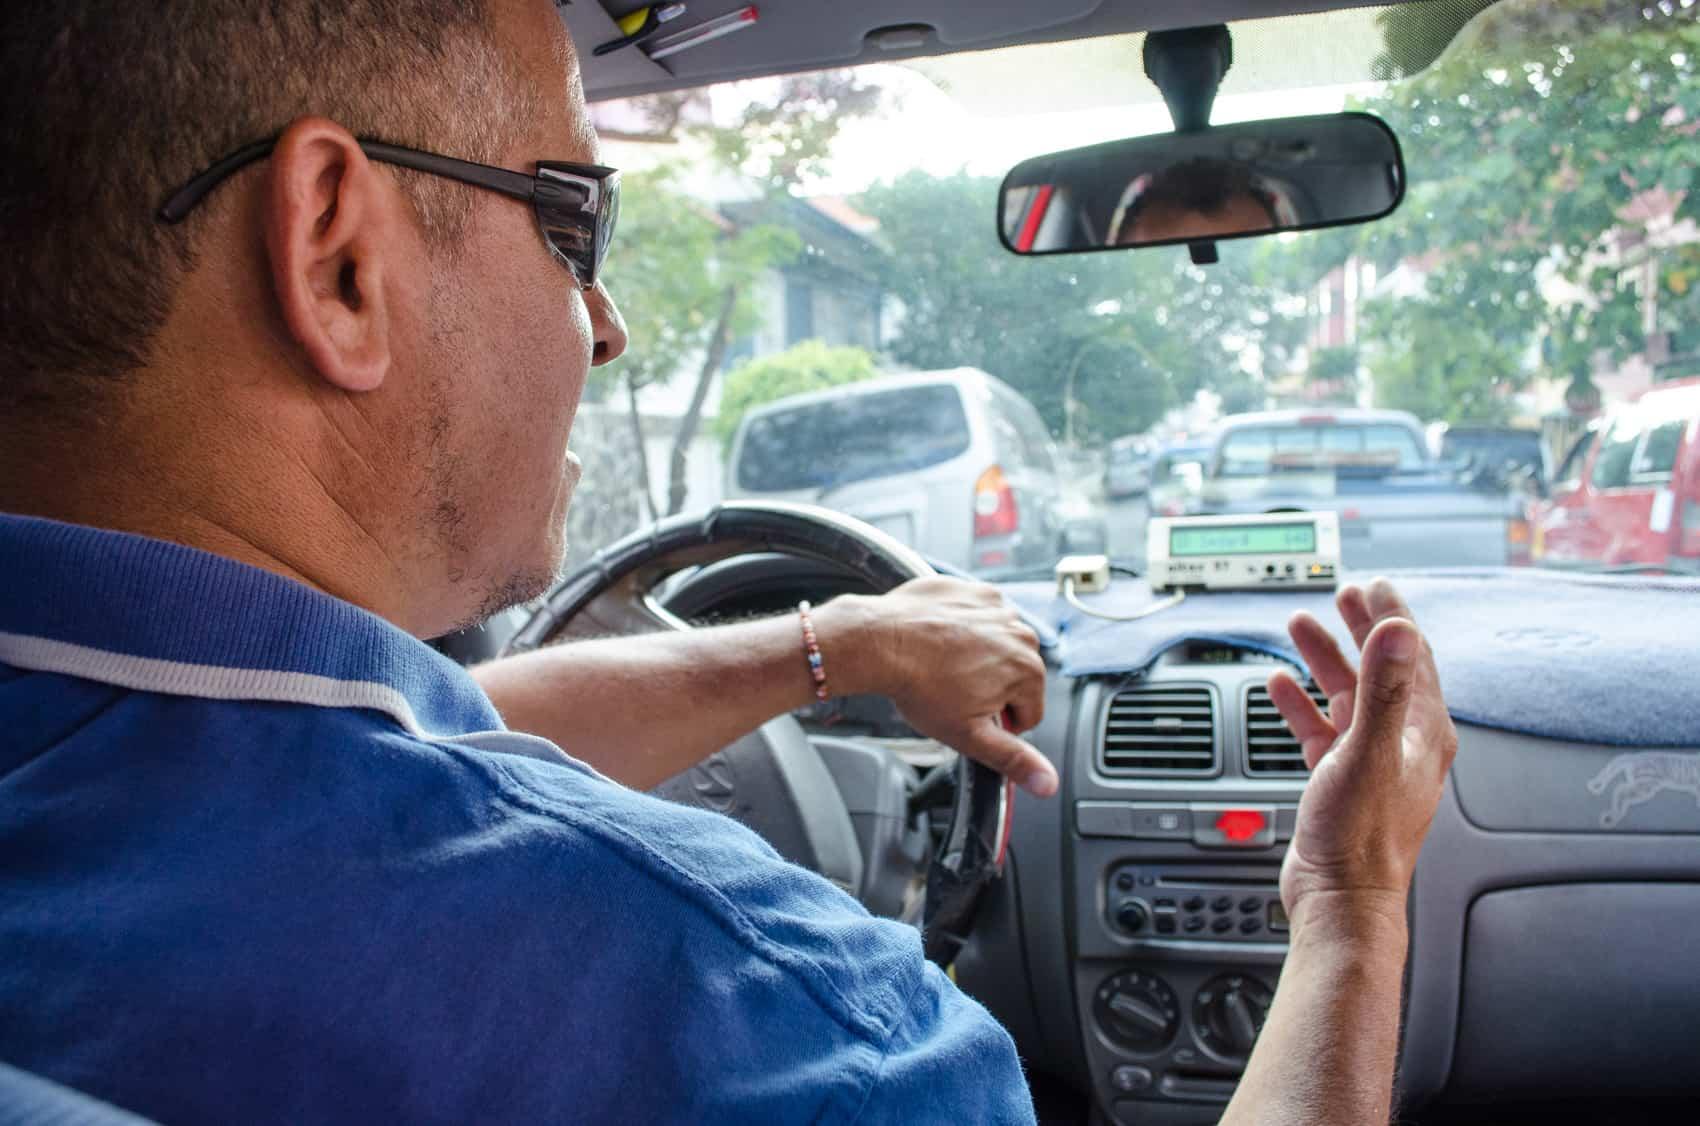 A taxi driver in Costa Rica